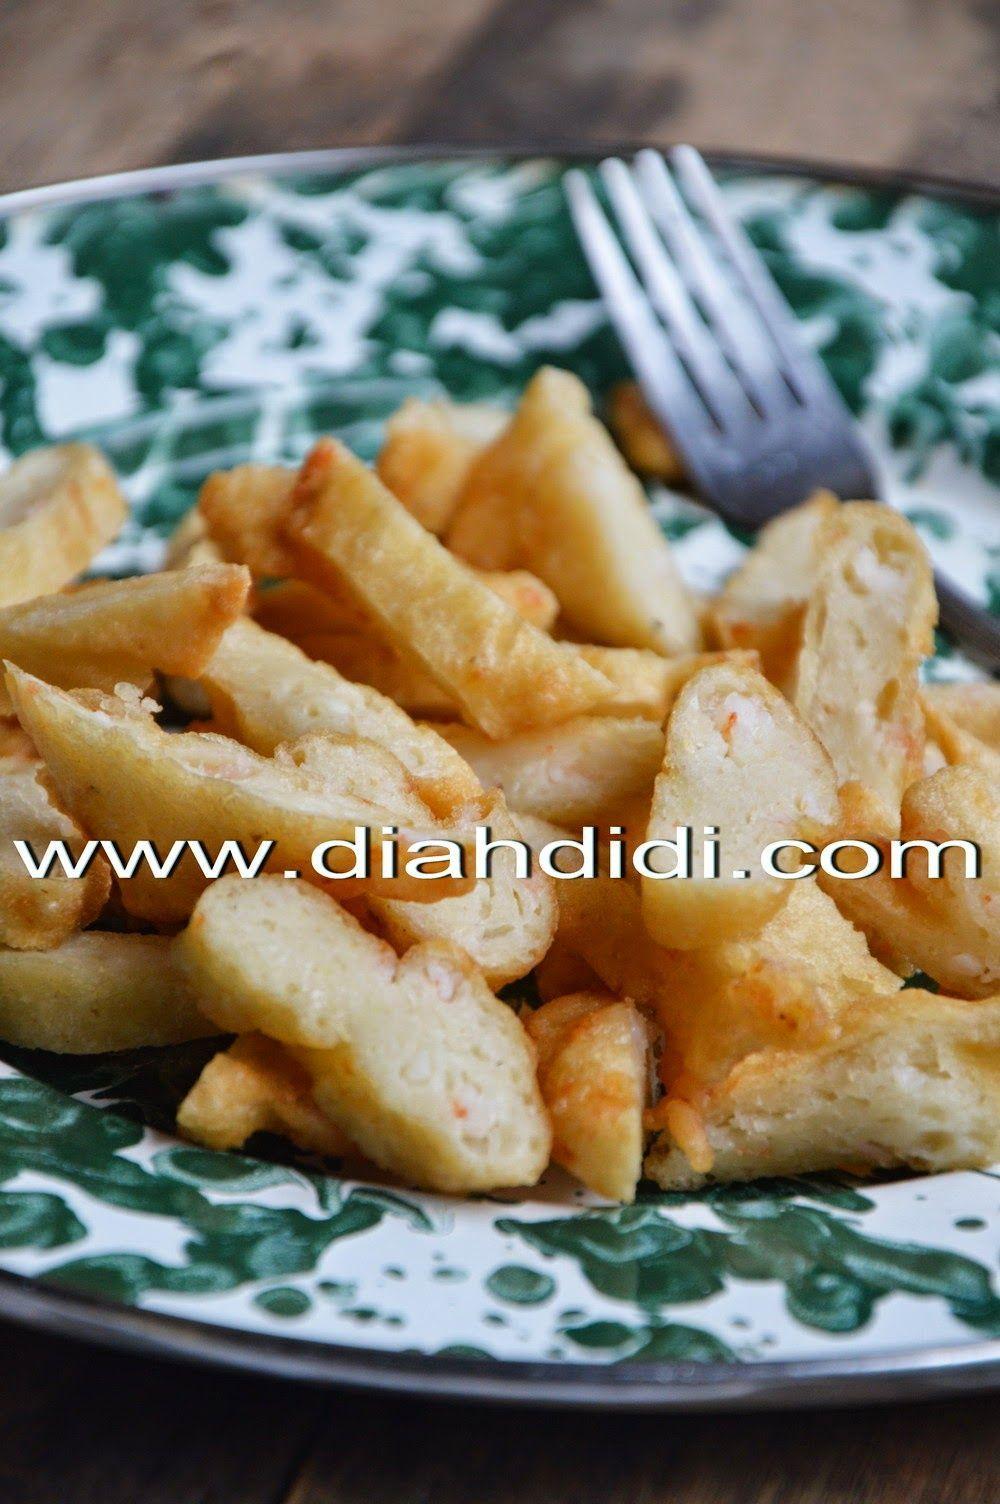 Kitchen Gandum Kekian Goreng Didis Udang Diahdiah Didi S Kitchen Gandum Kekian Goreng Udang Resep Masakan Makanan Dan Minuman Resep Masakan Indonesia